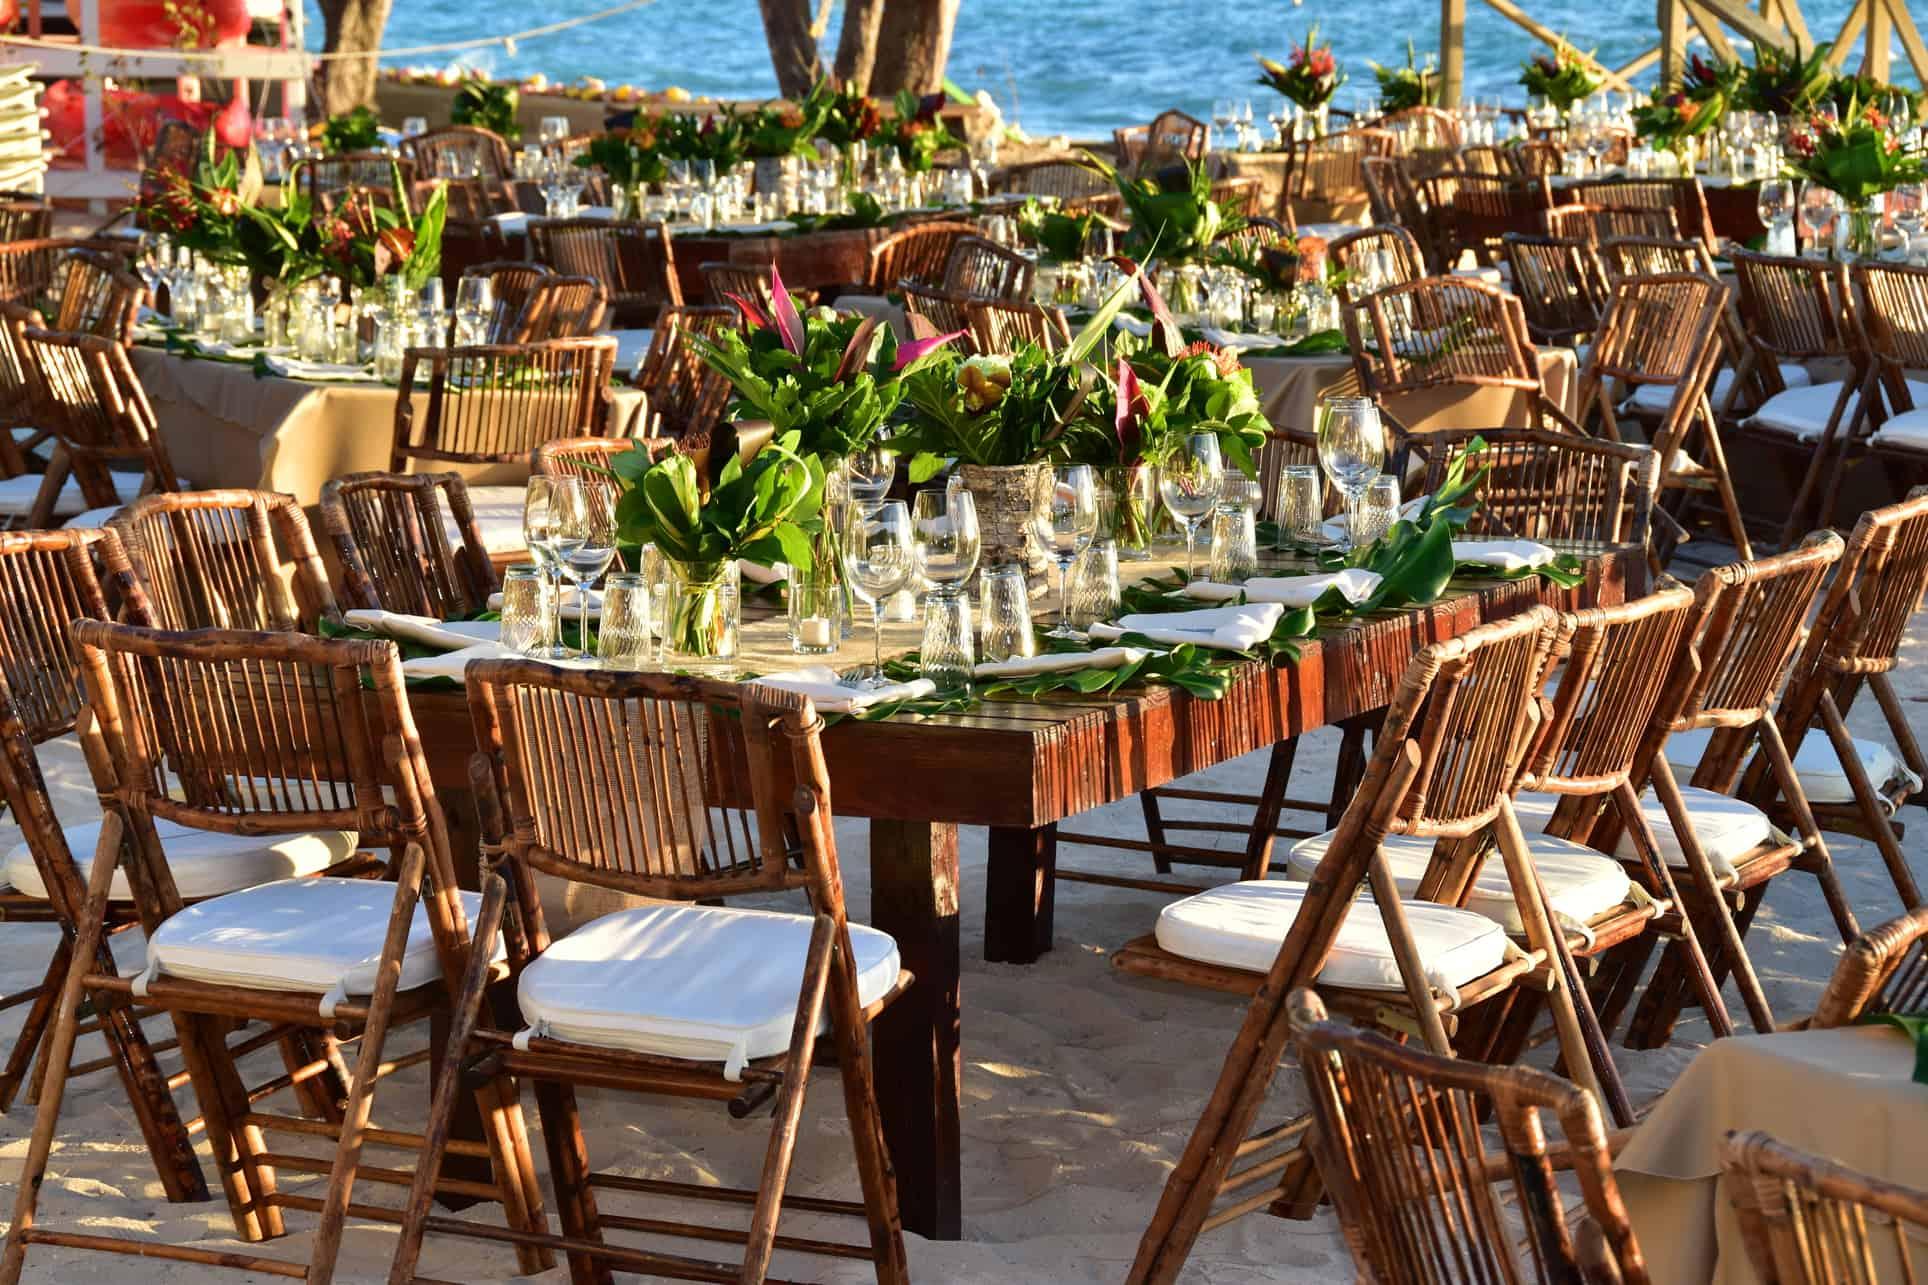 corporate tropical beach event reception cayman islands by celebrations ltd.